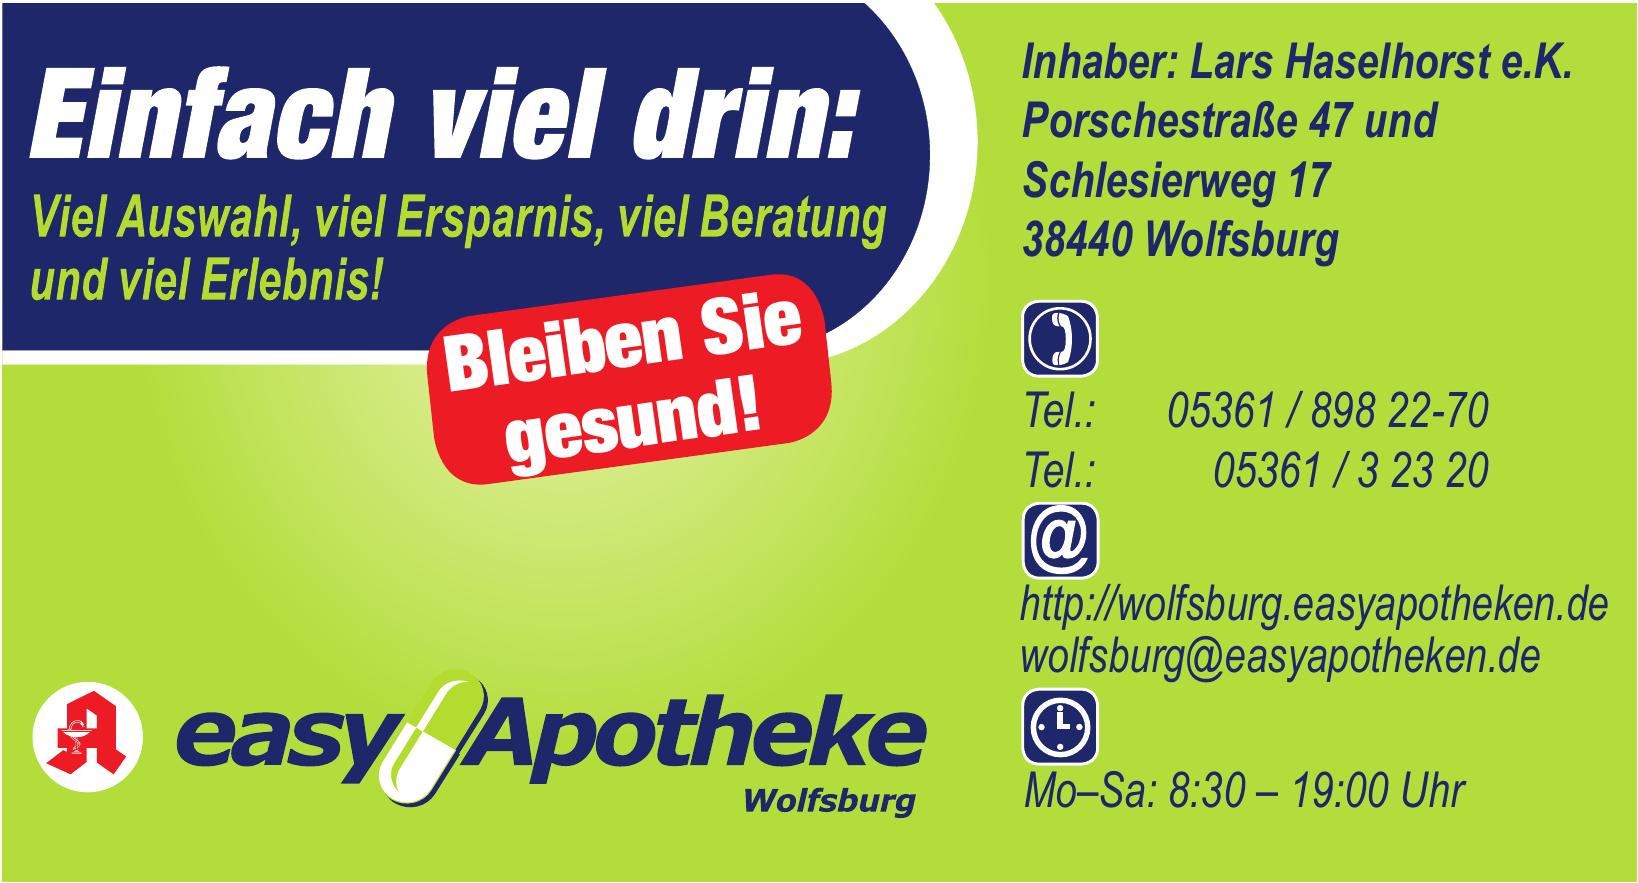 Easy Apotheke Wolfsburg